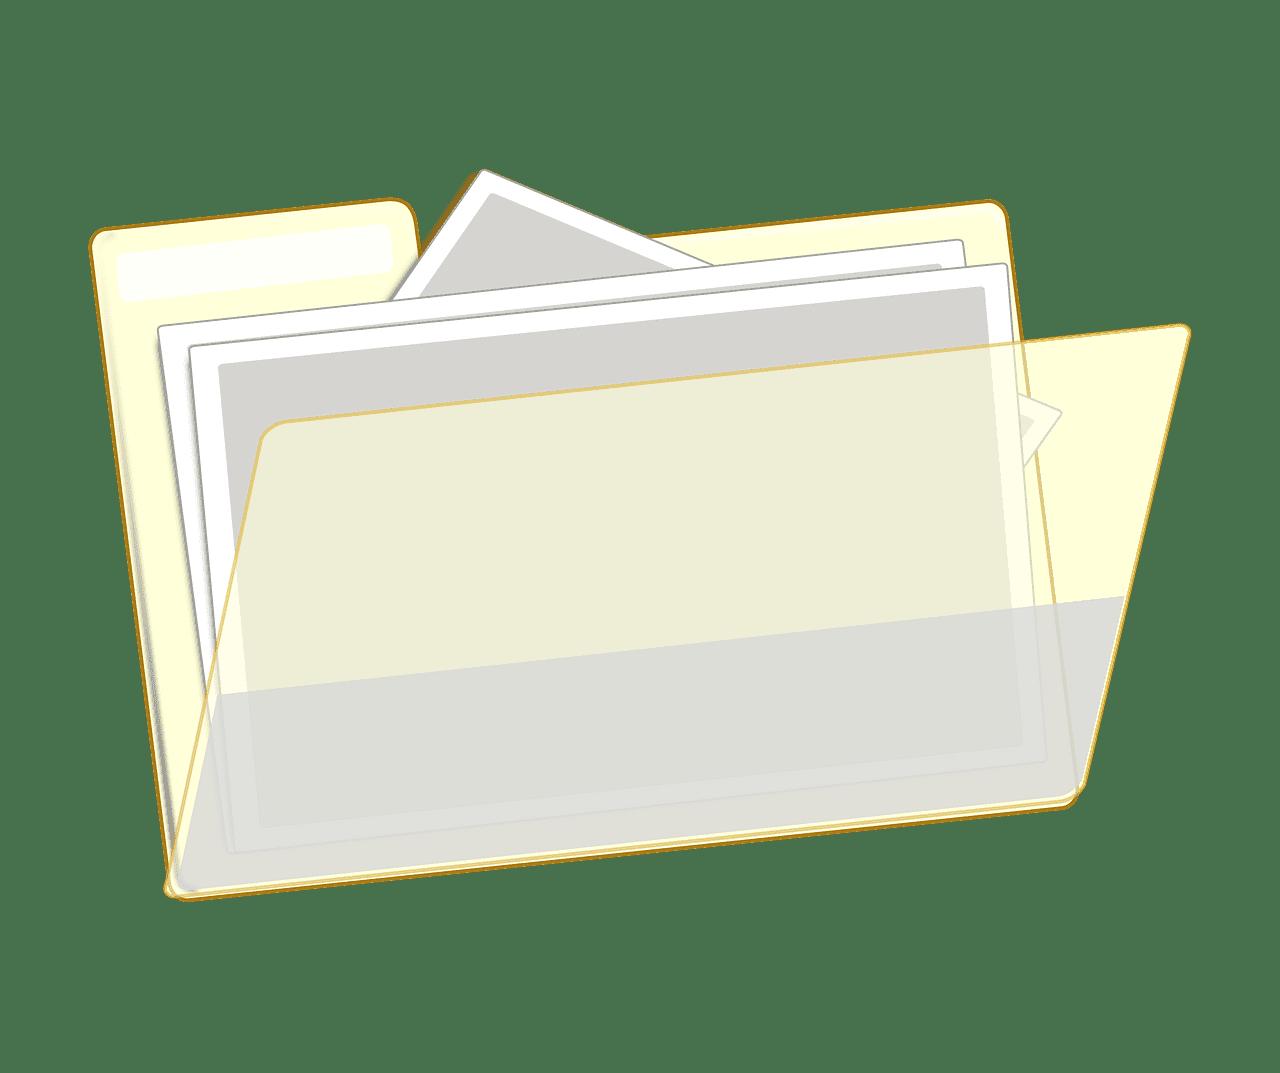 Folder clipart transparent 7